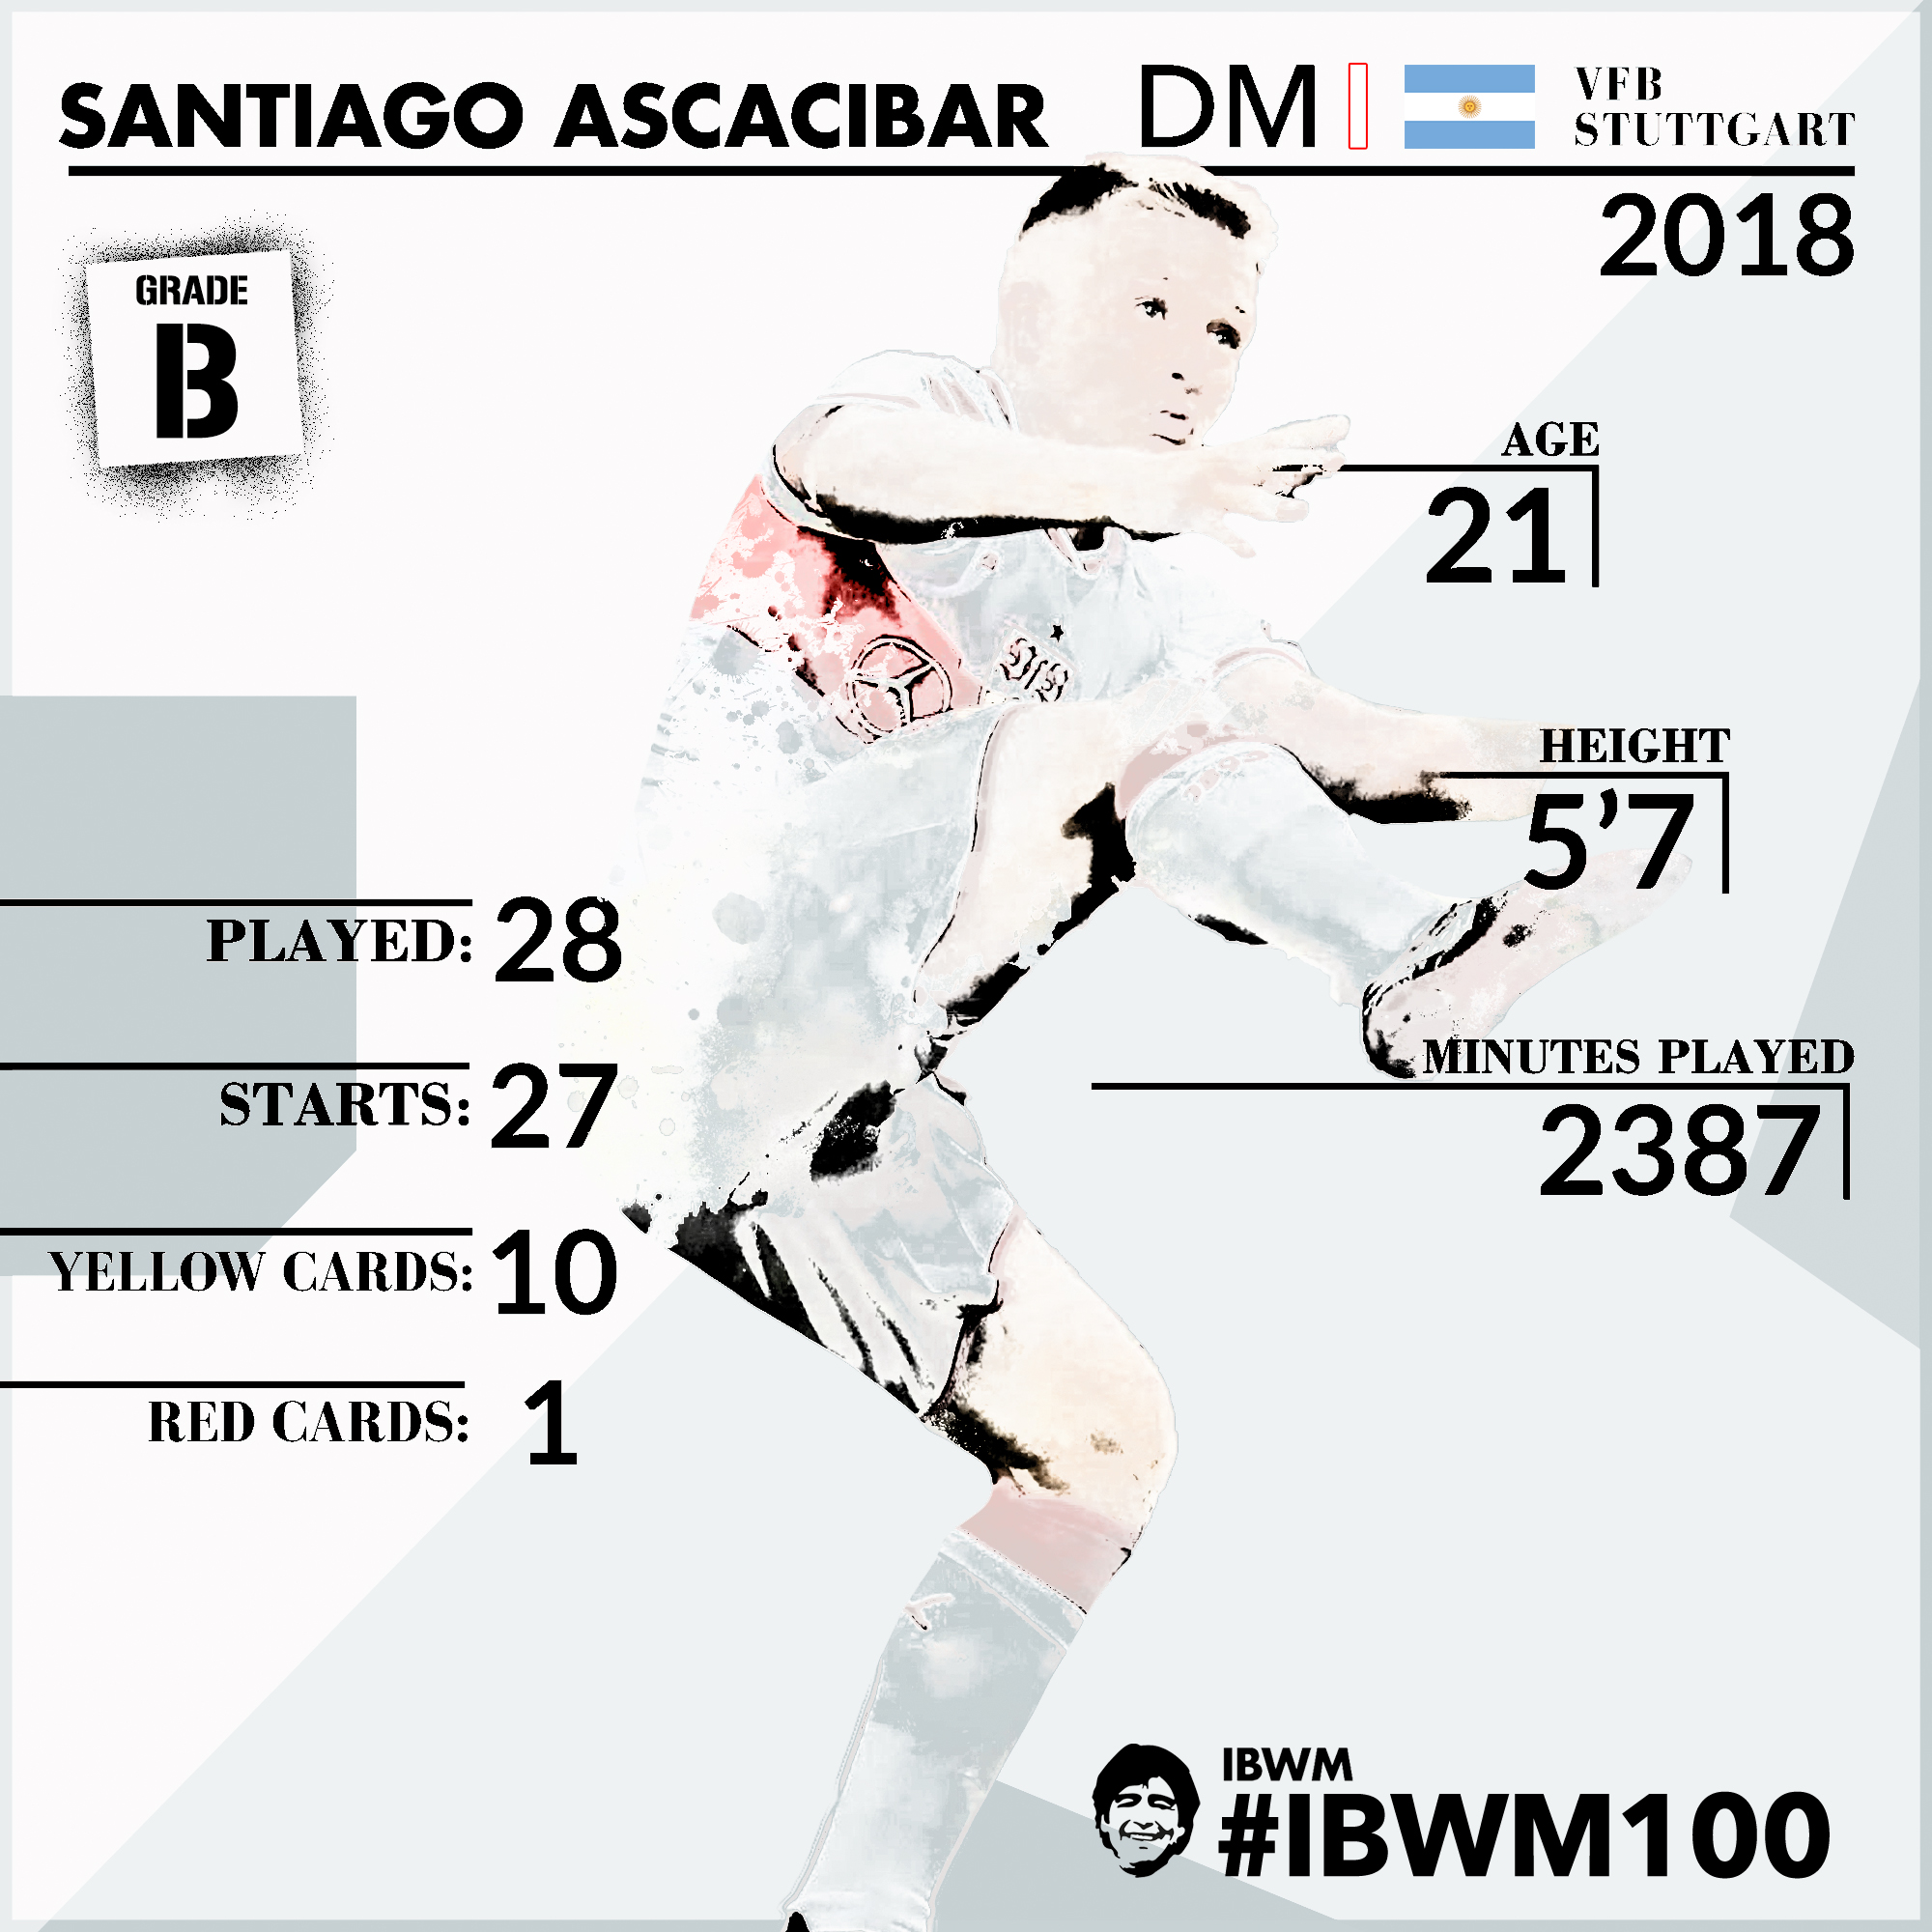 IBWM - Santiago Ascacibar.jpg